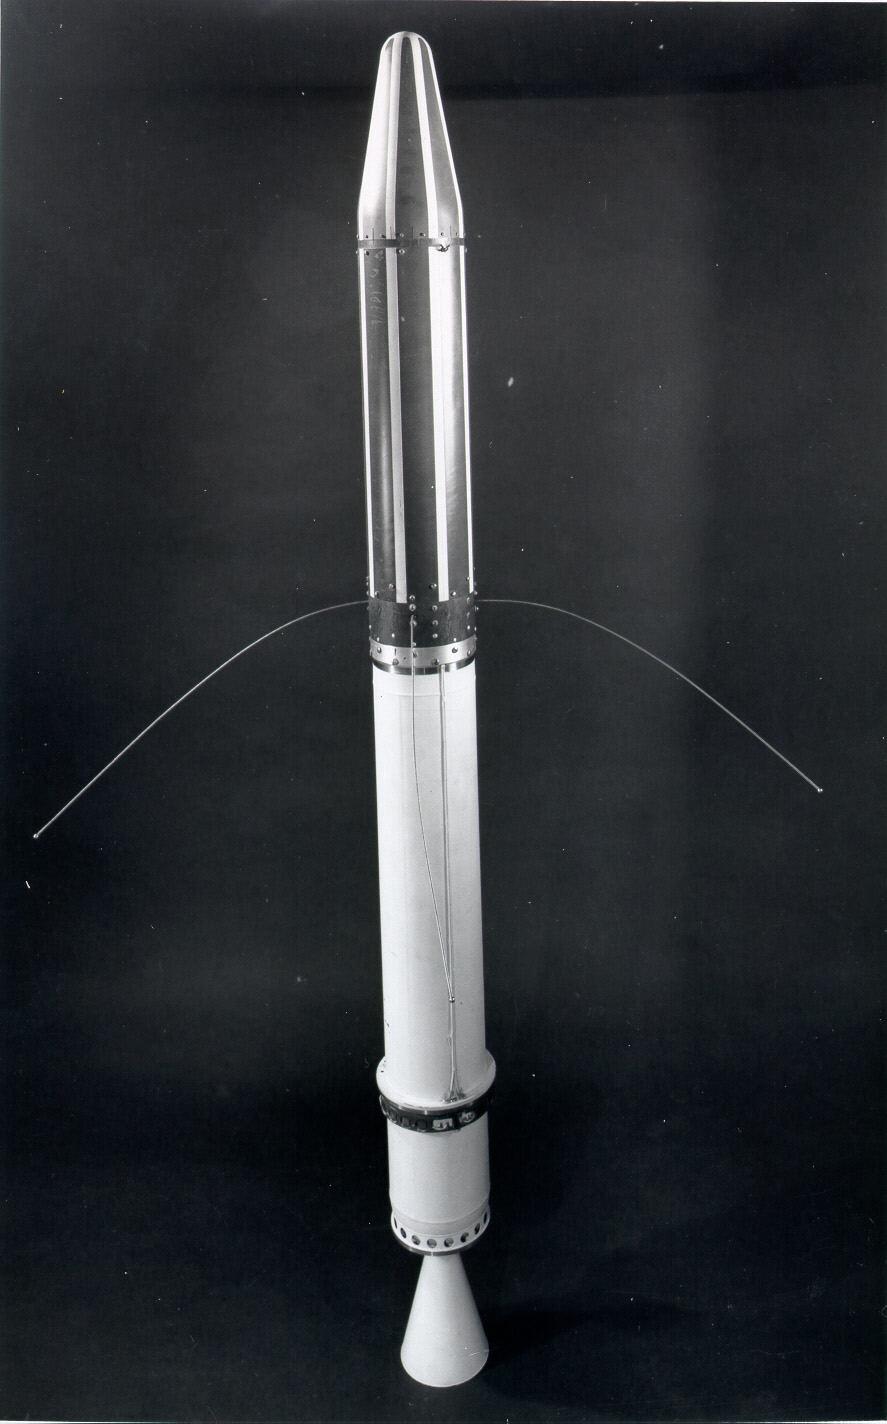 Image of : Satellite, Explorer I